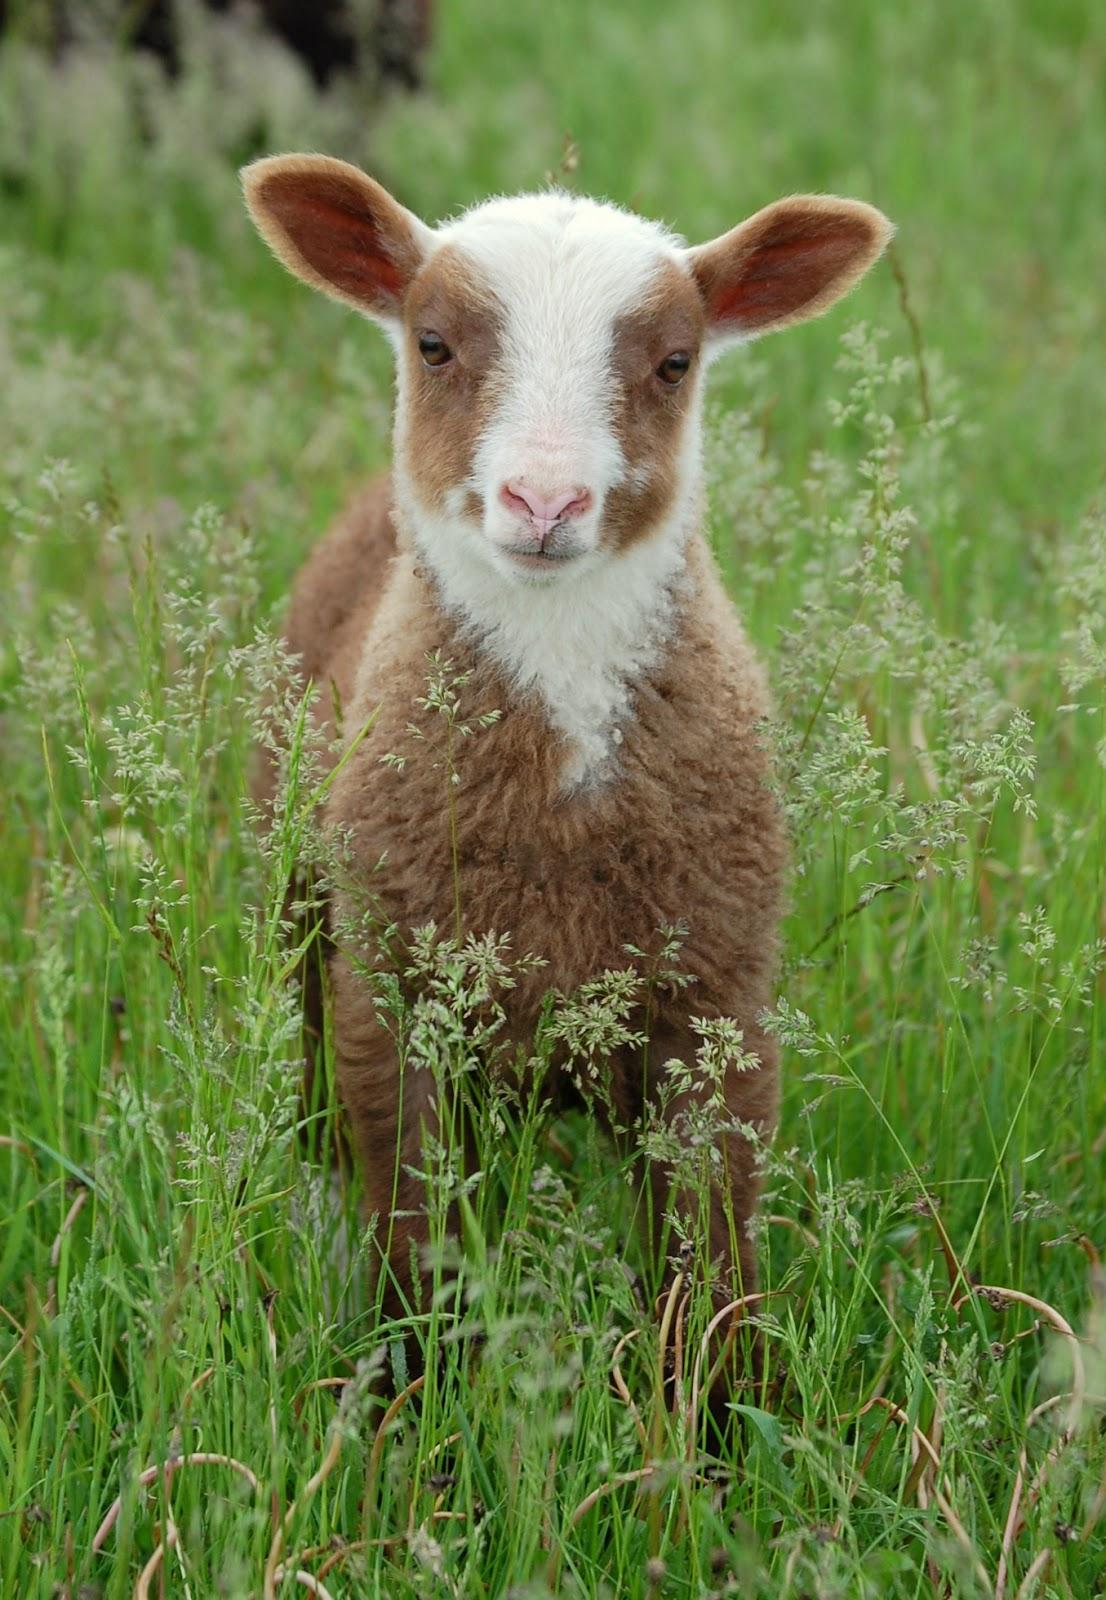 Crosswinds Farm | Shetland sheep, Heritage breeds, Animals